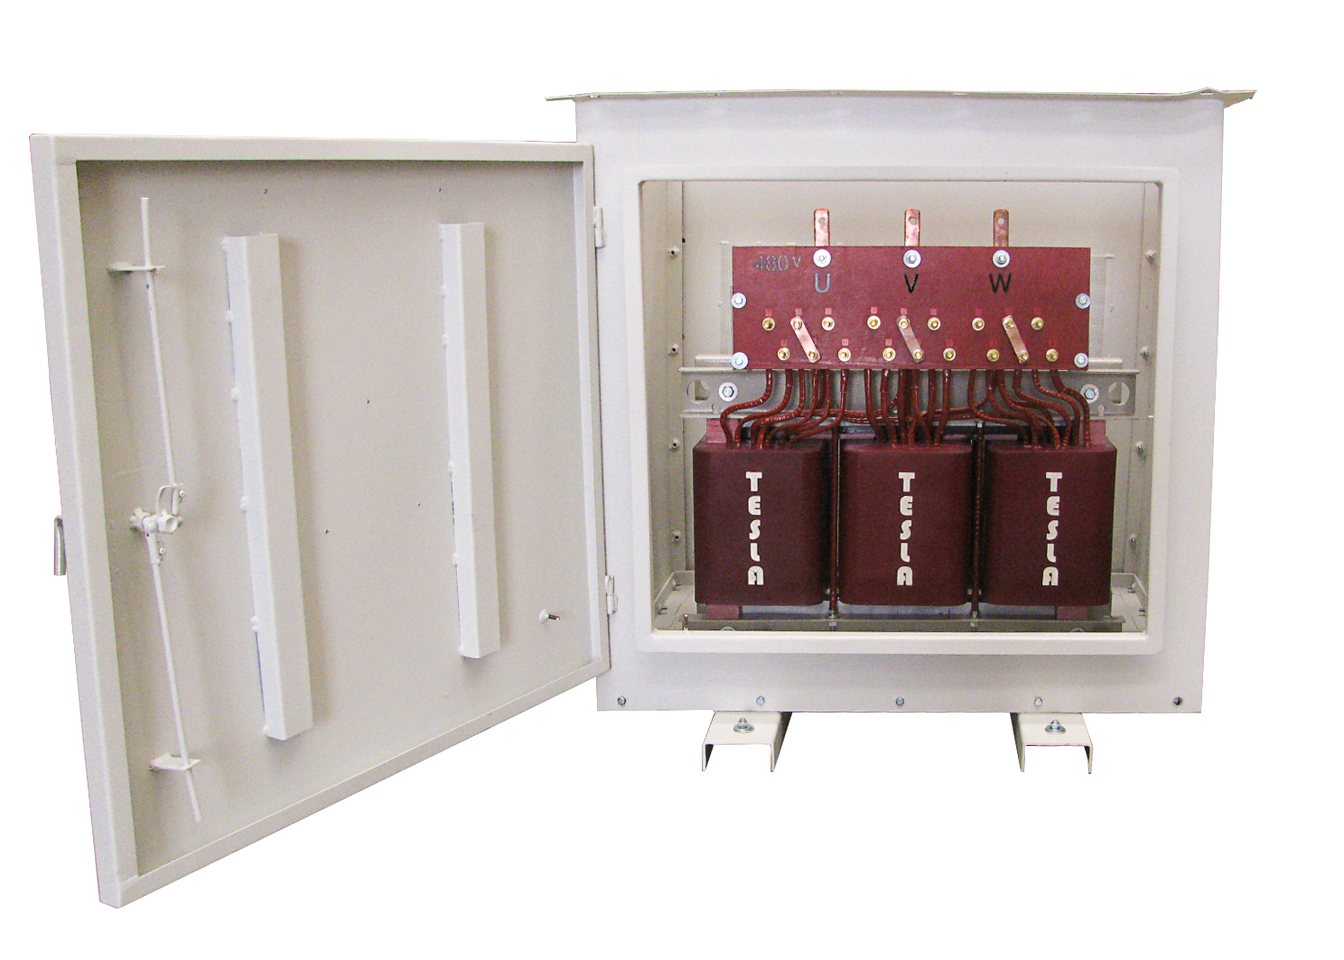 Gabinete de protección IP 54 para tranasformador Encapsulado en resina epóxica clase F 112,5 kVA Serie 1.1/1.1kV